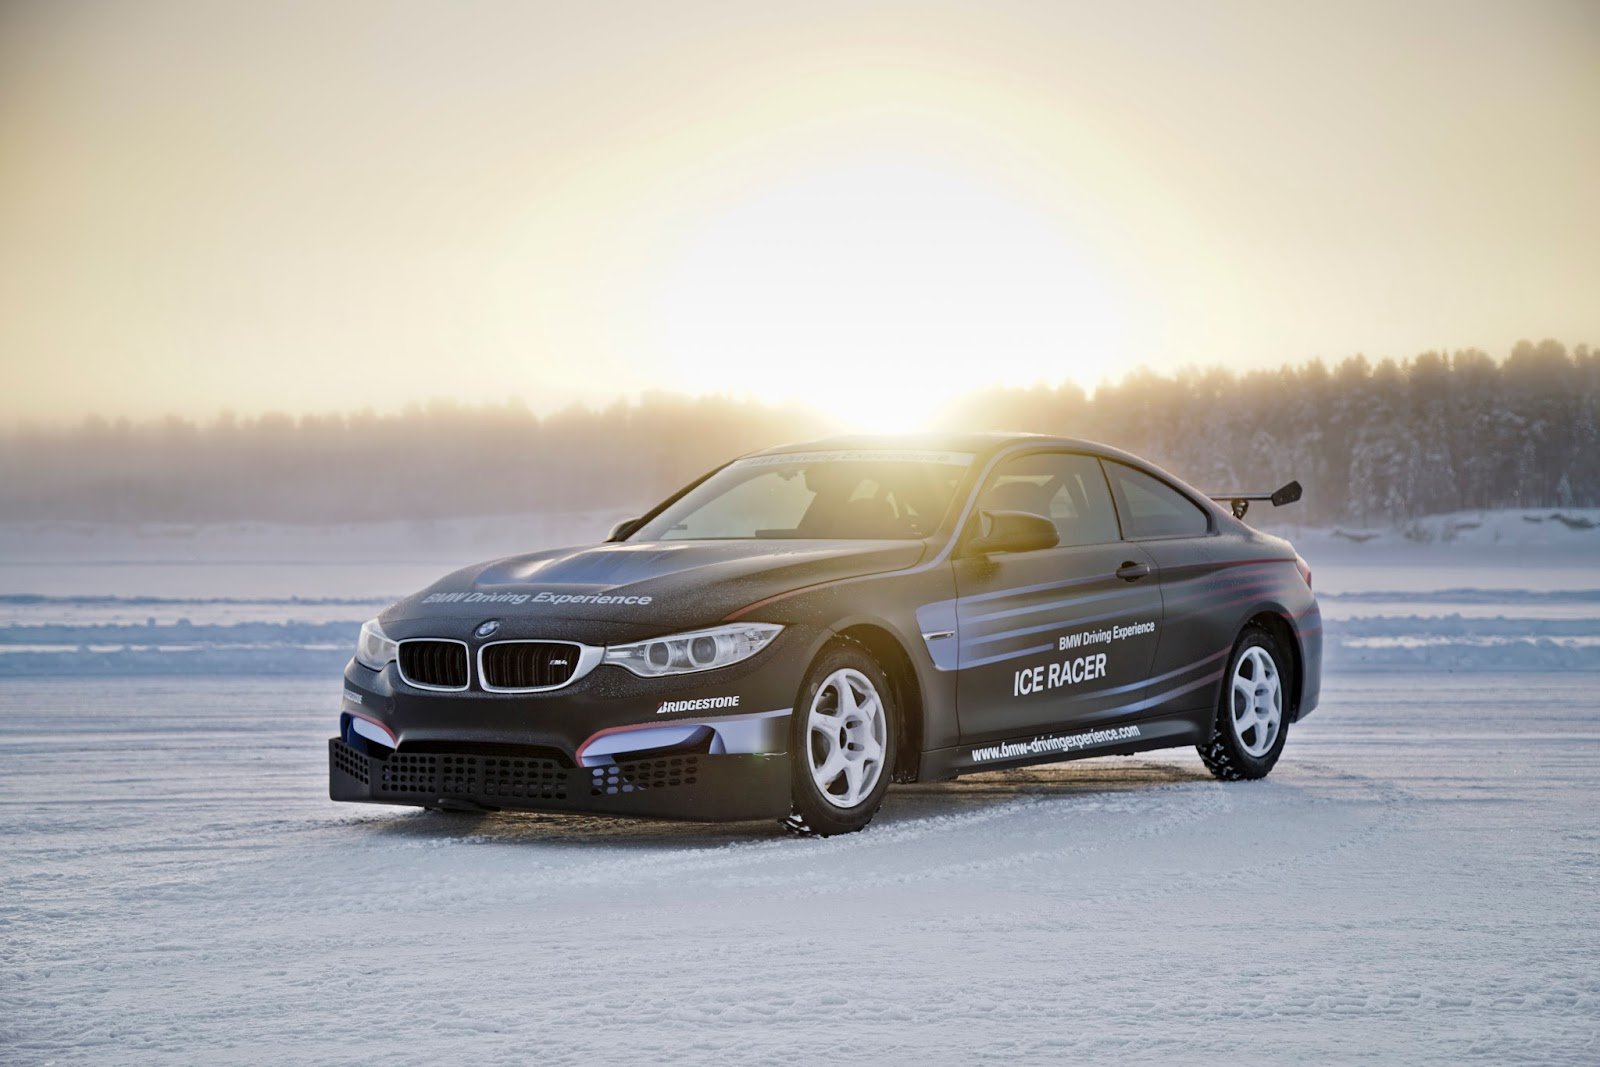 P90254182 highRes bmw mini driving ex 1 Γίνε καλύτερος οδηγός κάτω από όλες τις συνθήκες, με Bmw και Mini BMW, BMW i, BMW M, Driver, Driving Skills, Safety, οδήγηση, οδηγοί